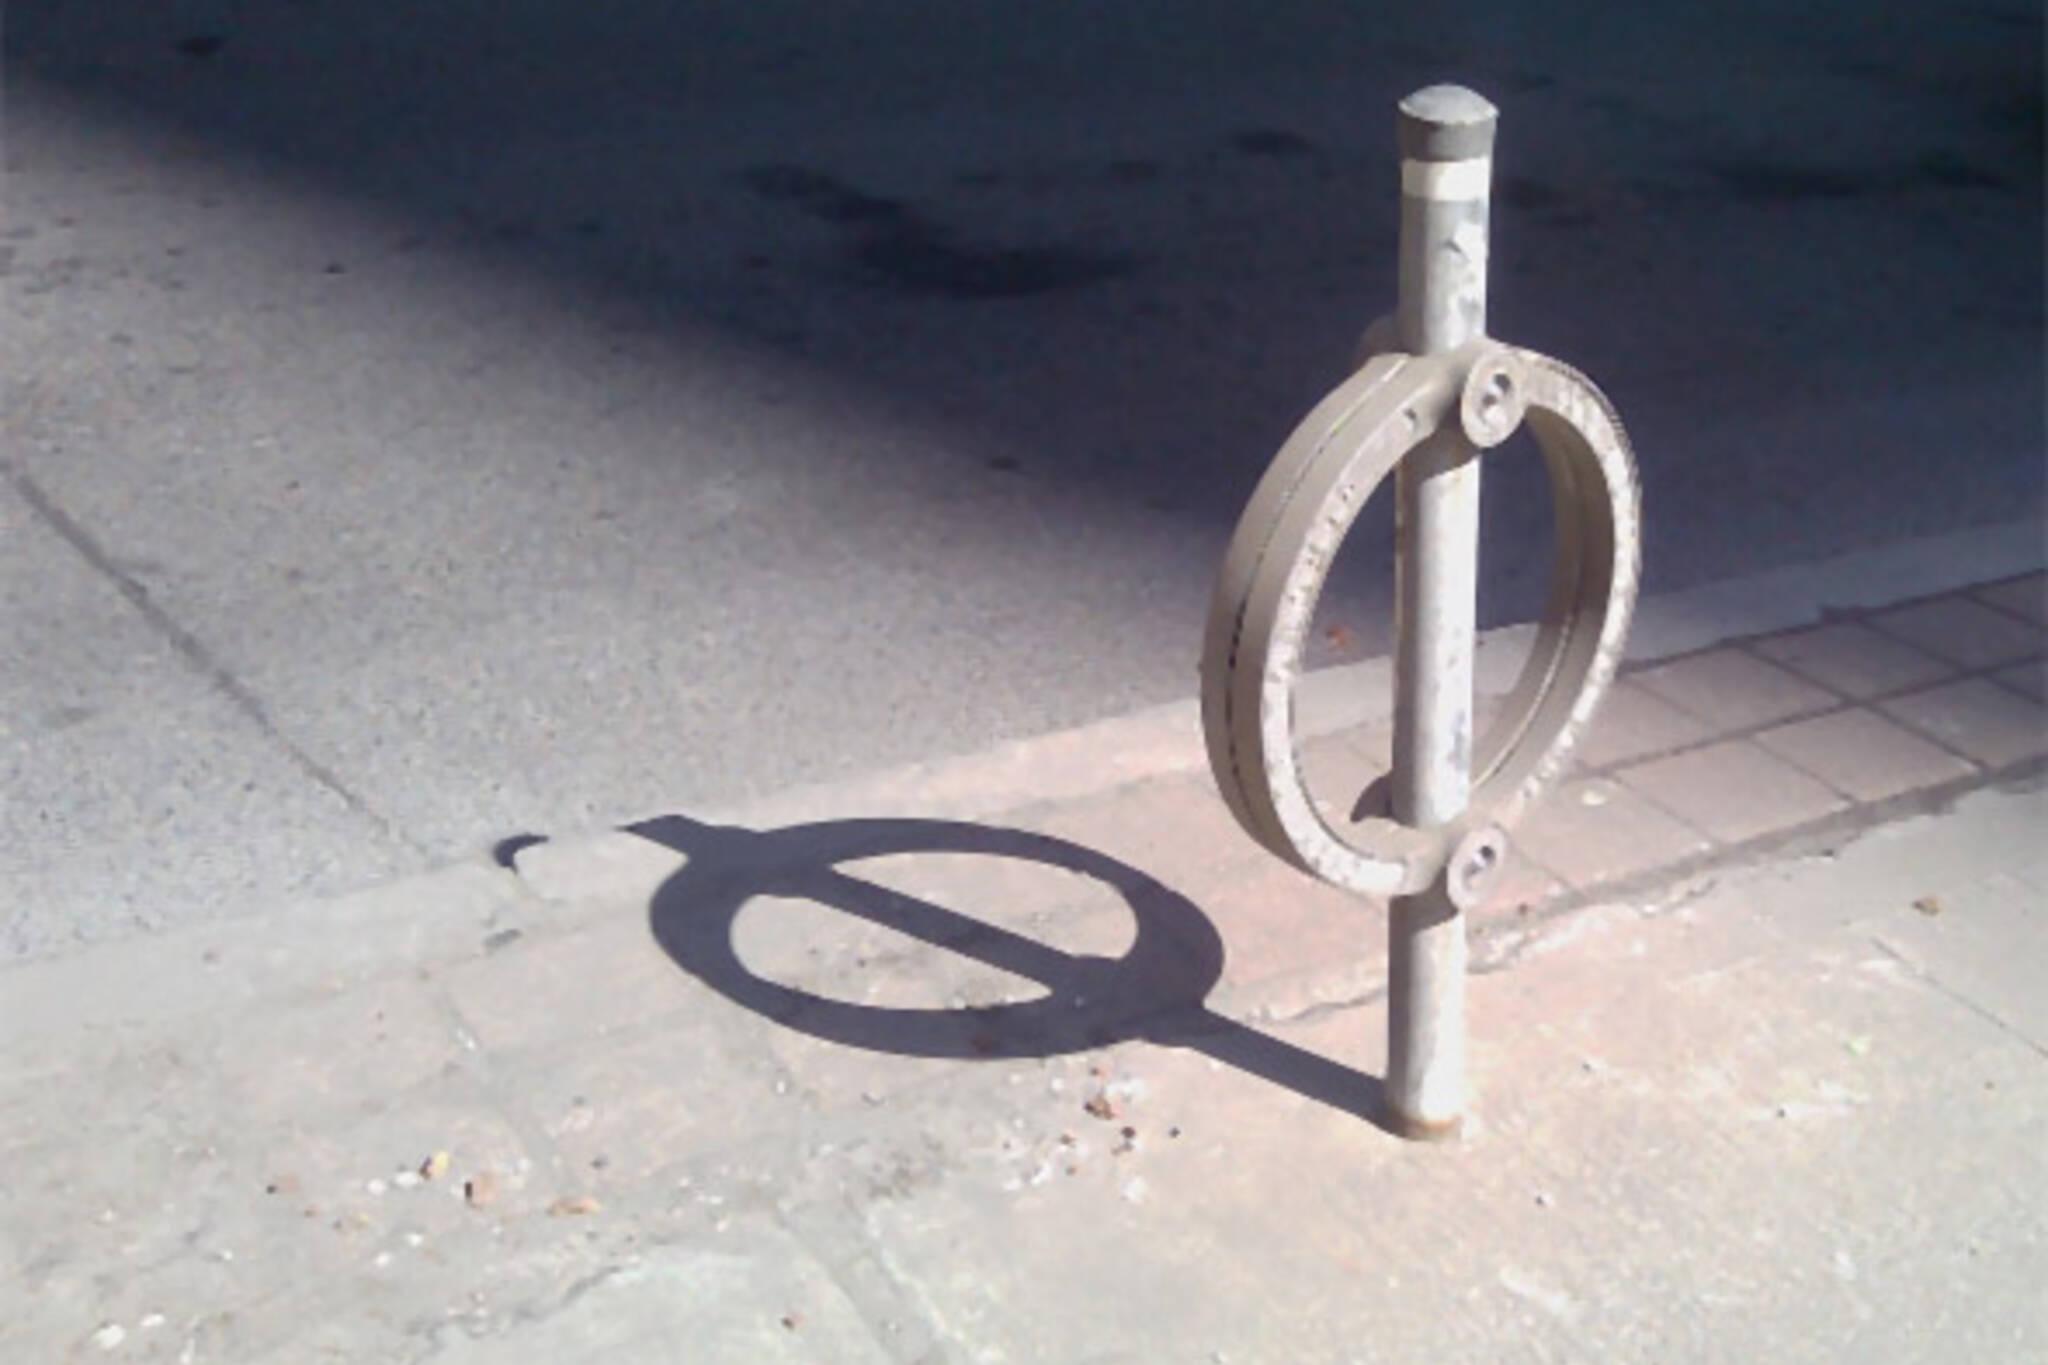 toronto abandoned bikes